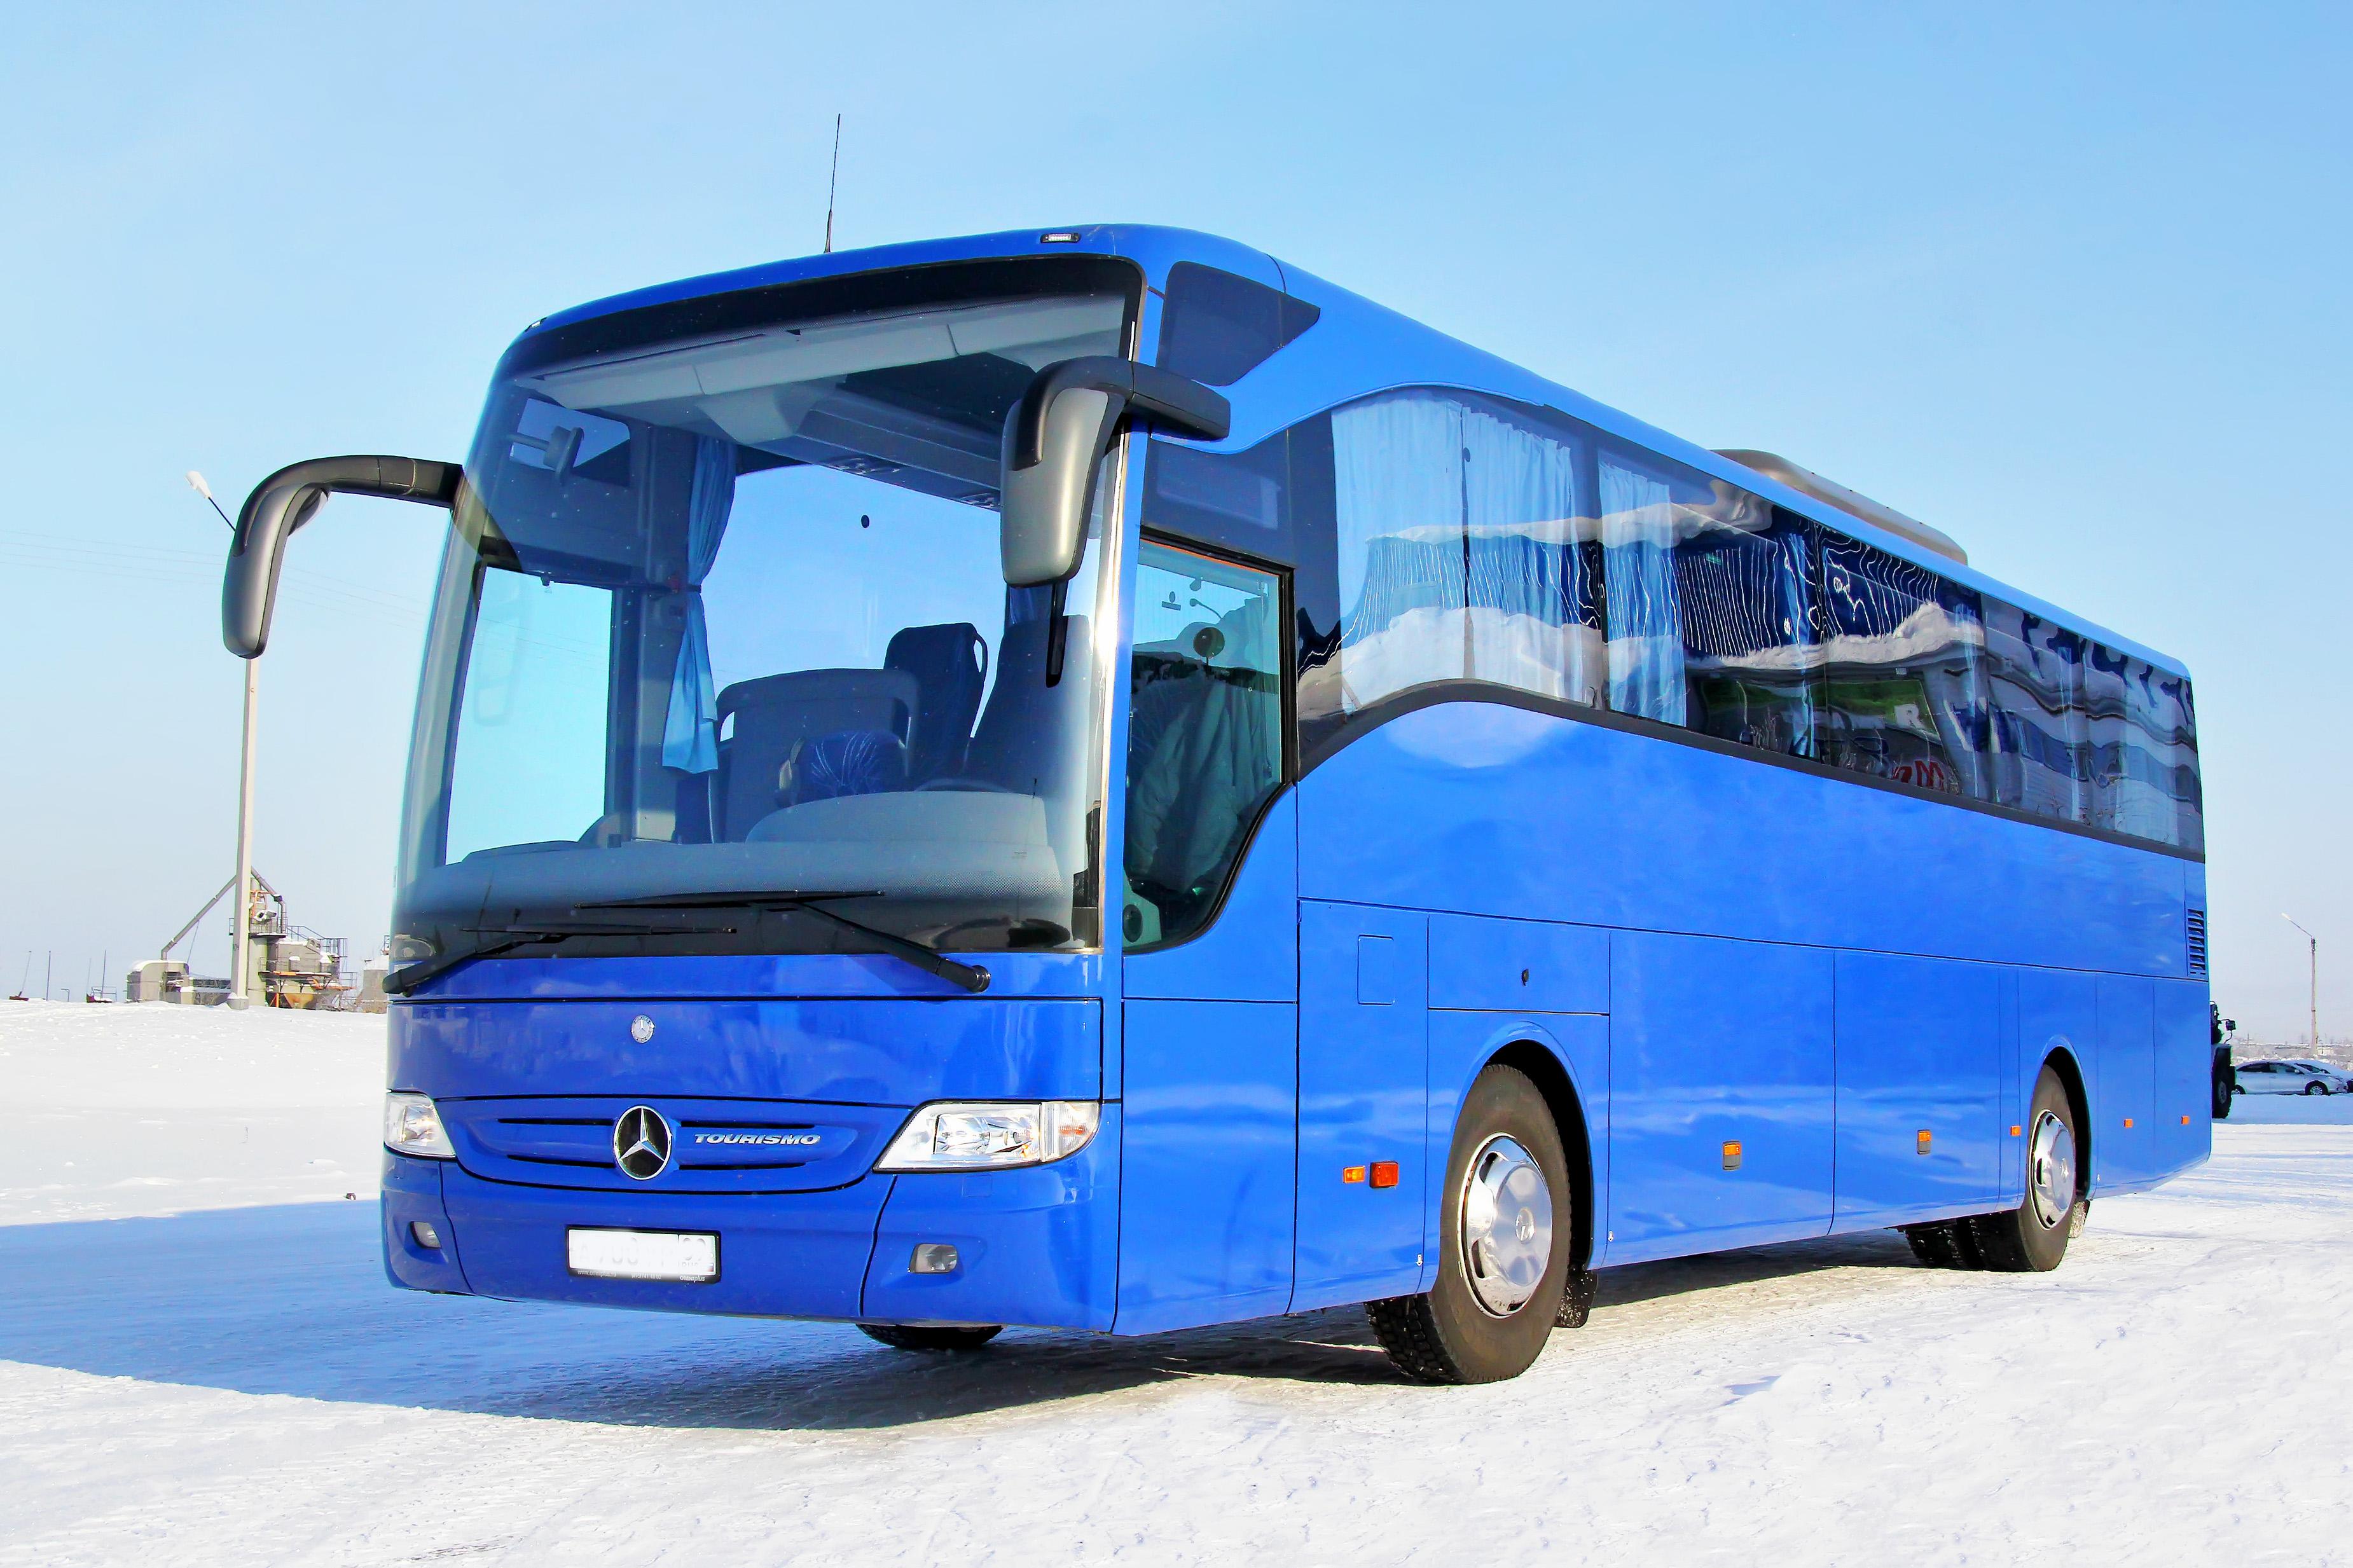 Std Fleet Blue Coach on Snow